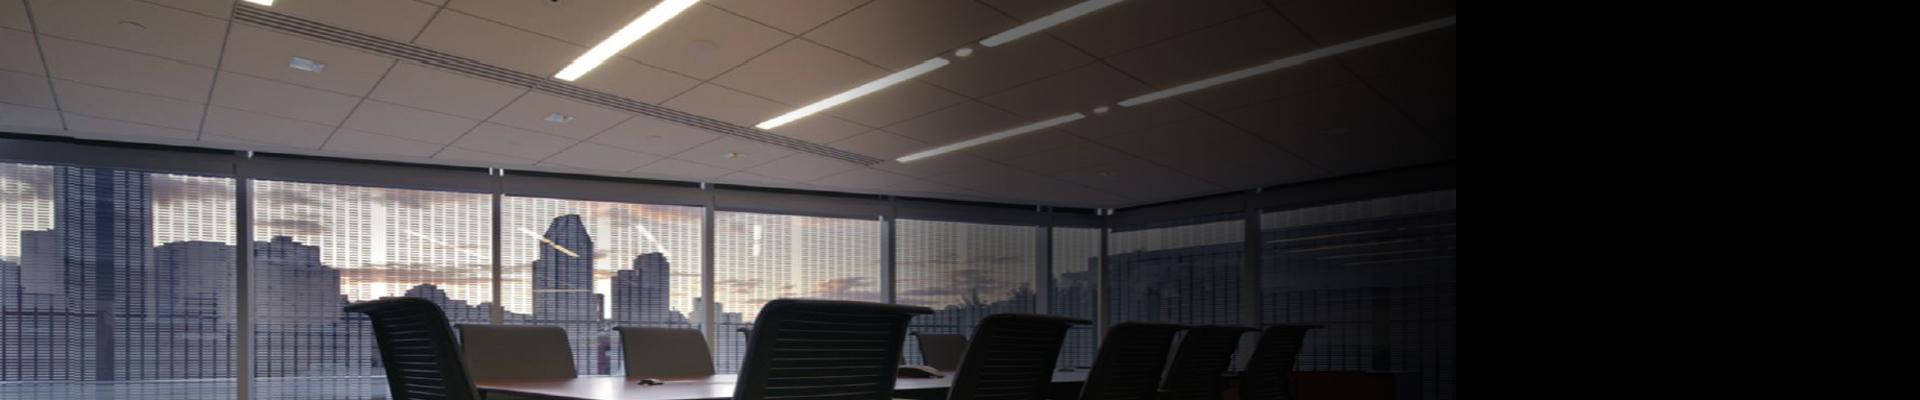 Lithonia Lighting available at NALP